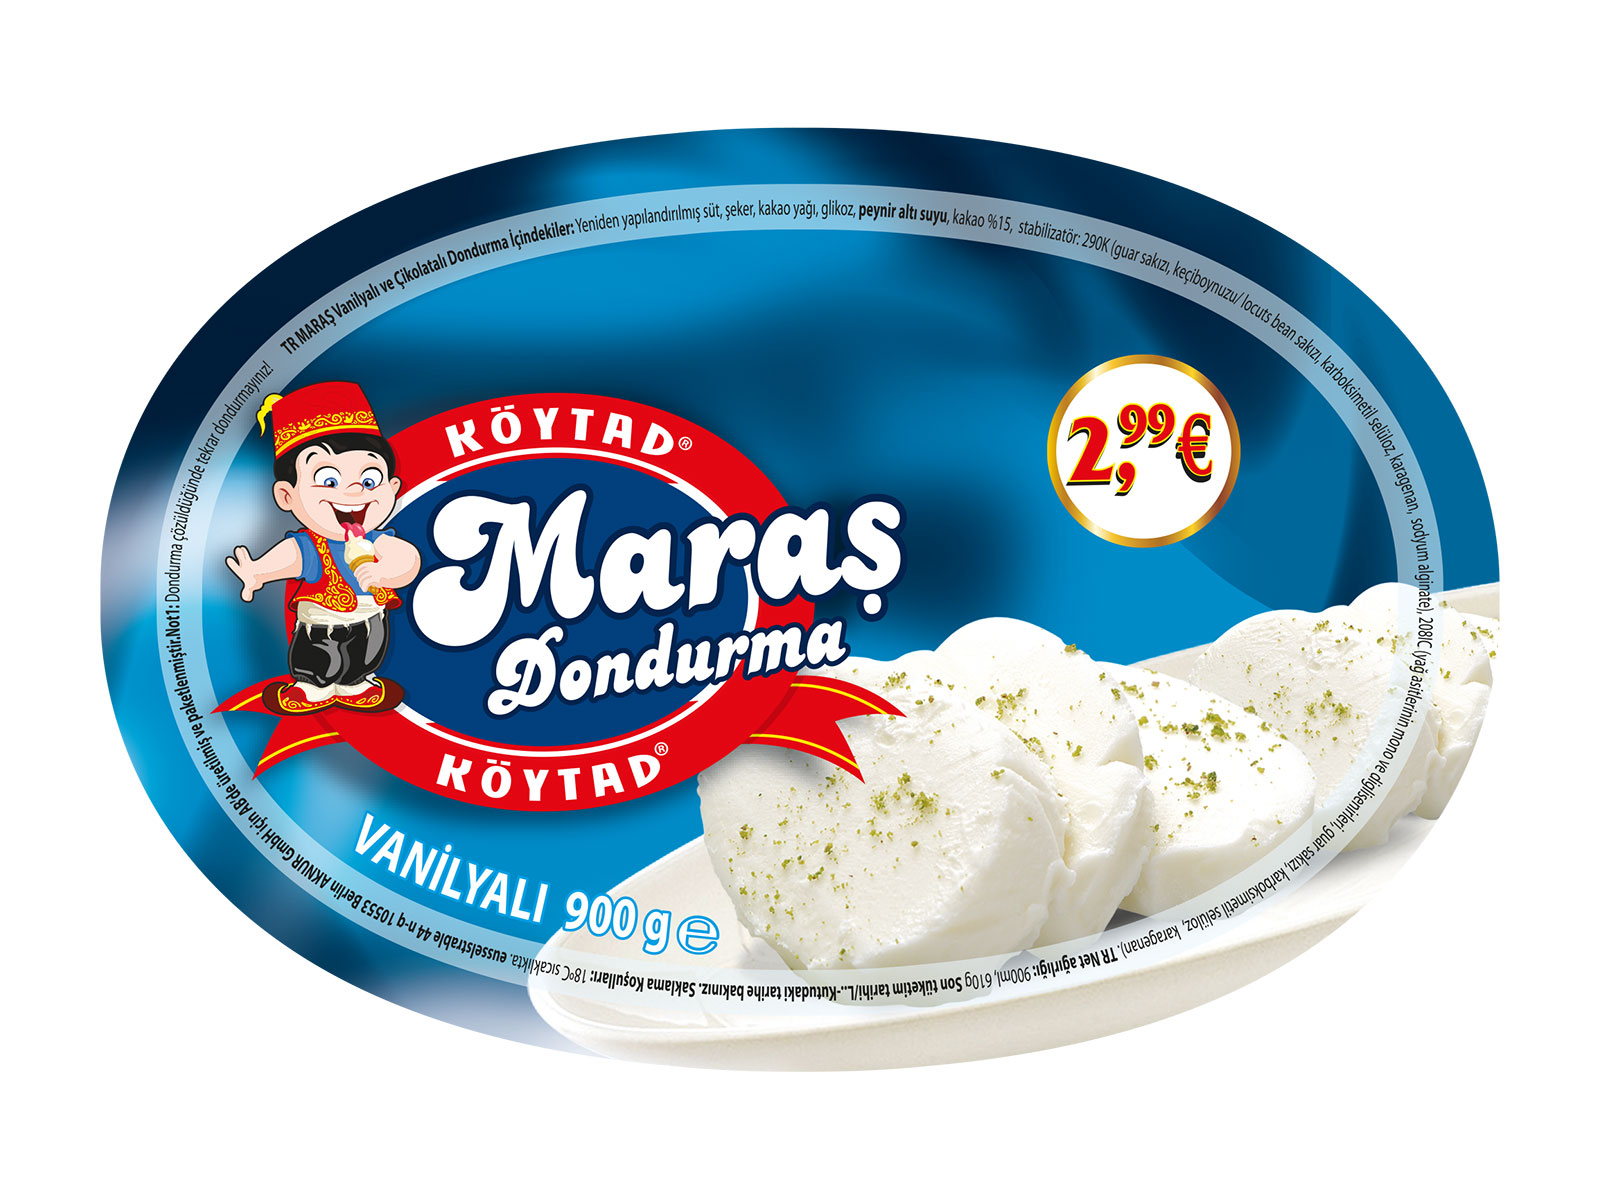 Koytad-Maras-Dondurma-Vanilyali-2